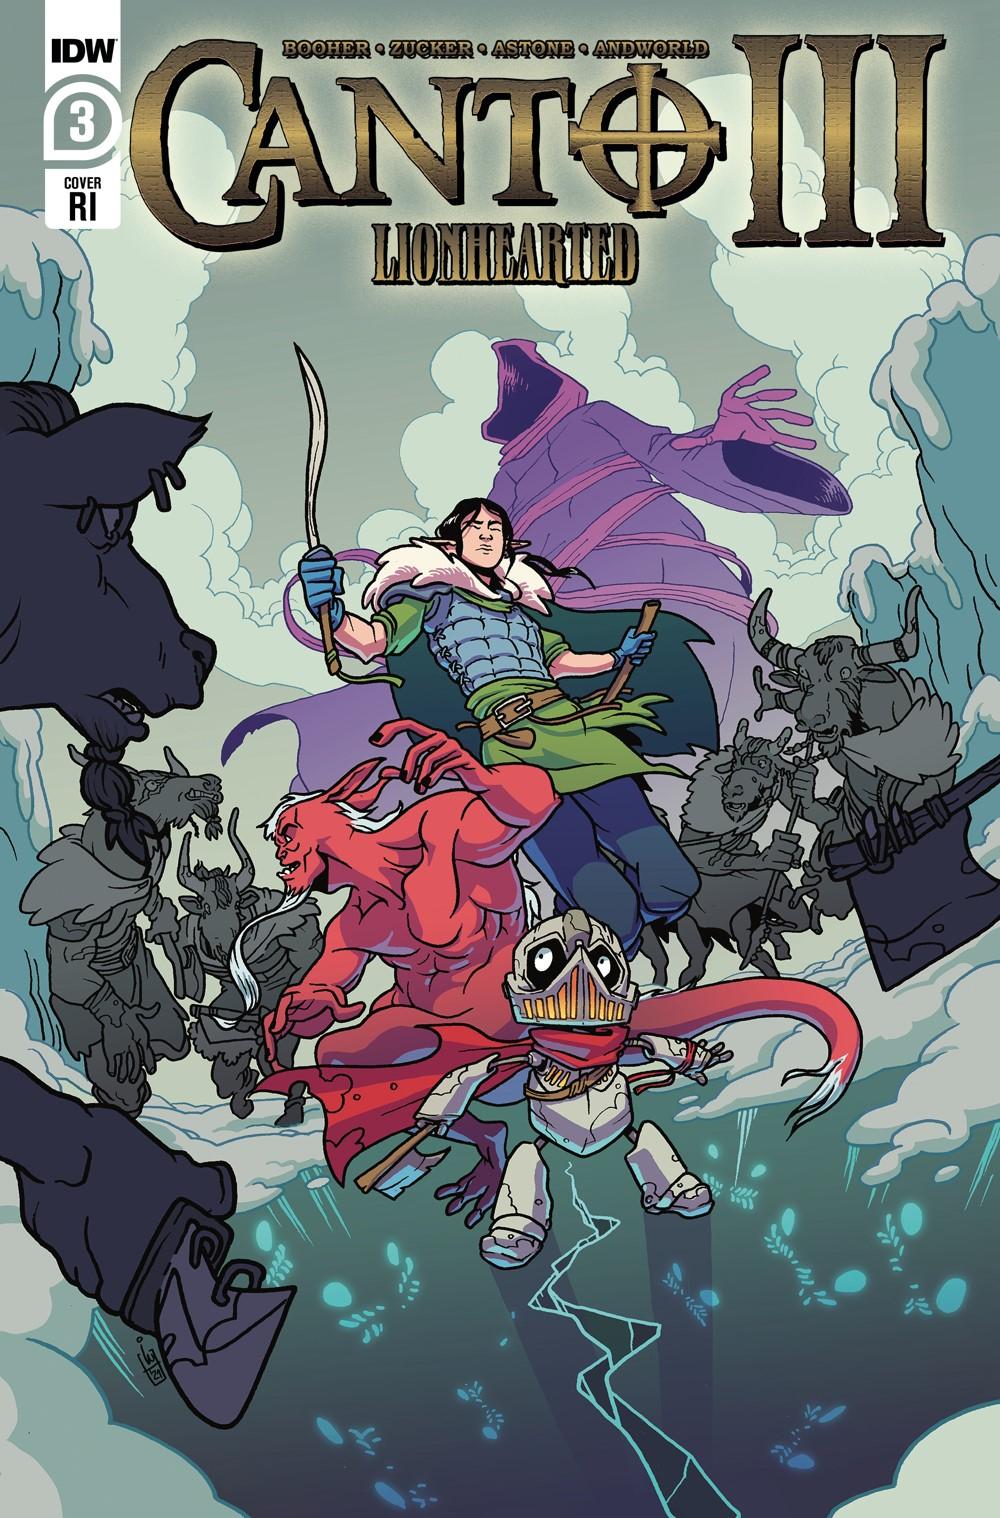 Canto-Lionhearted03_cvrRI ComicList Previews: CANTO III LIONHEARTED #3 (OF 6)